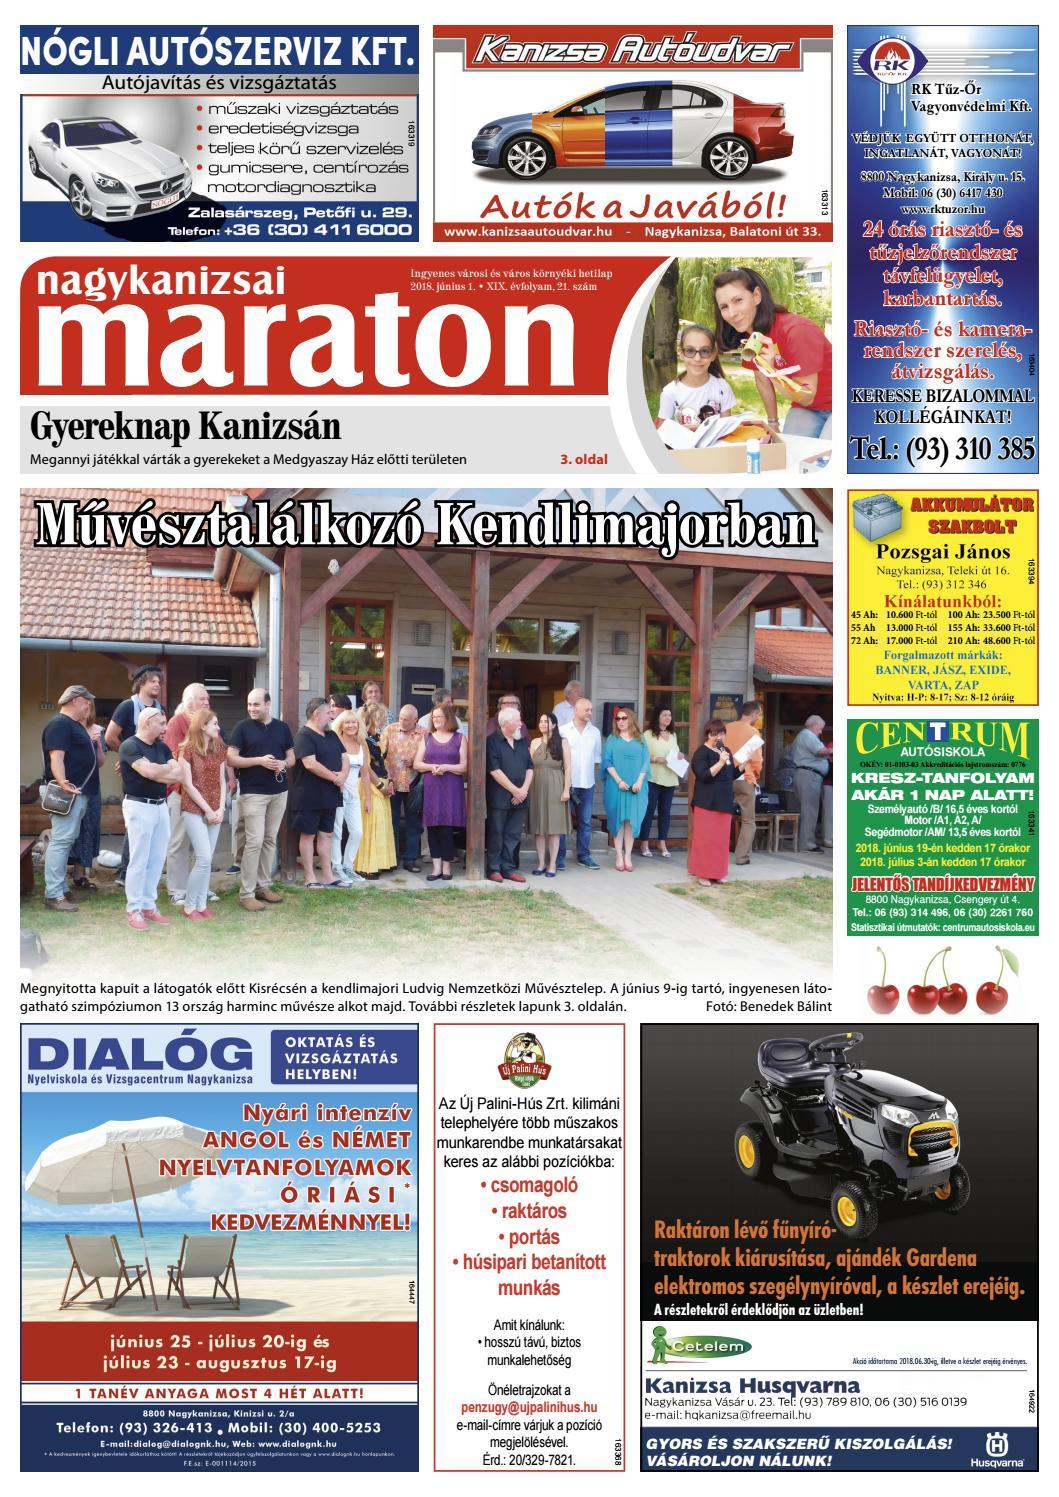 Nagykanizsai Maraton - 2018. 06. 01. by Maraton Lapcsoport Kft. - issuu 04cde6212a